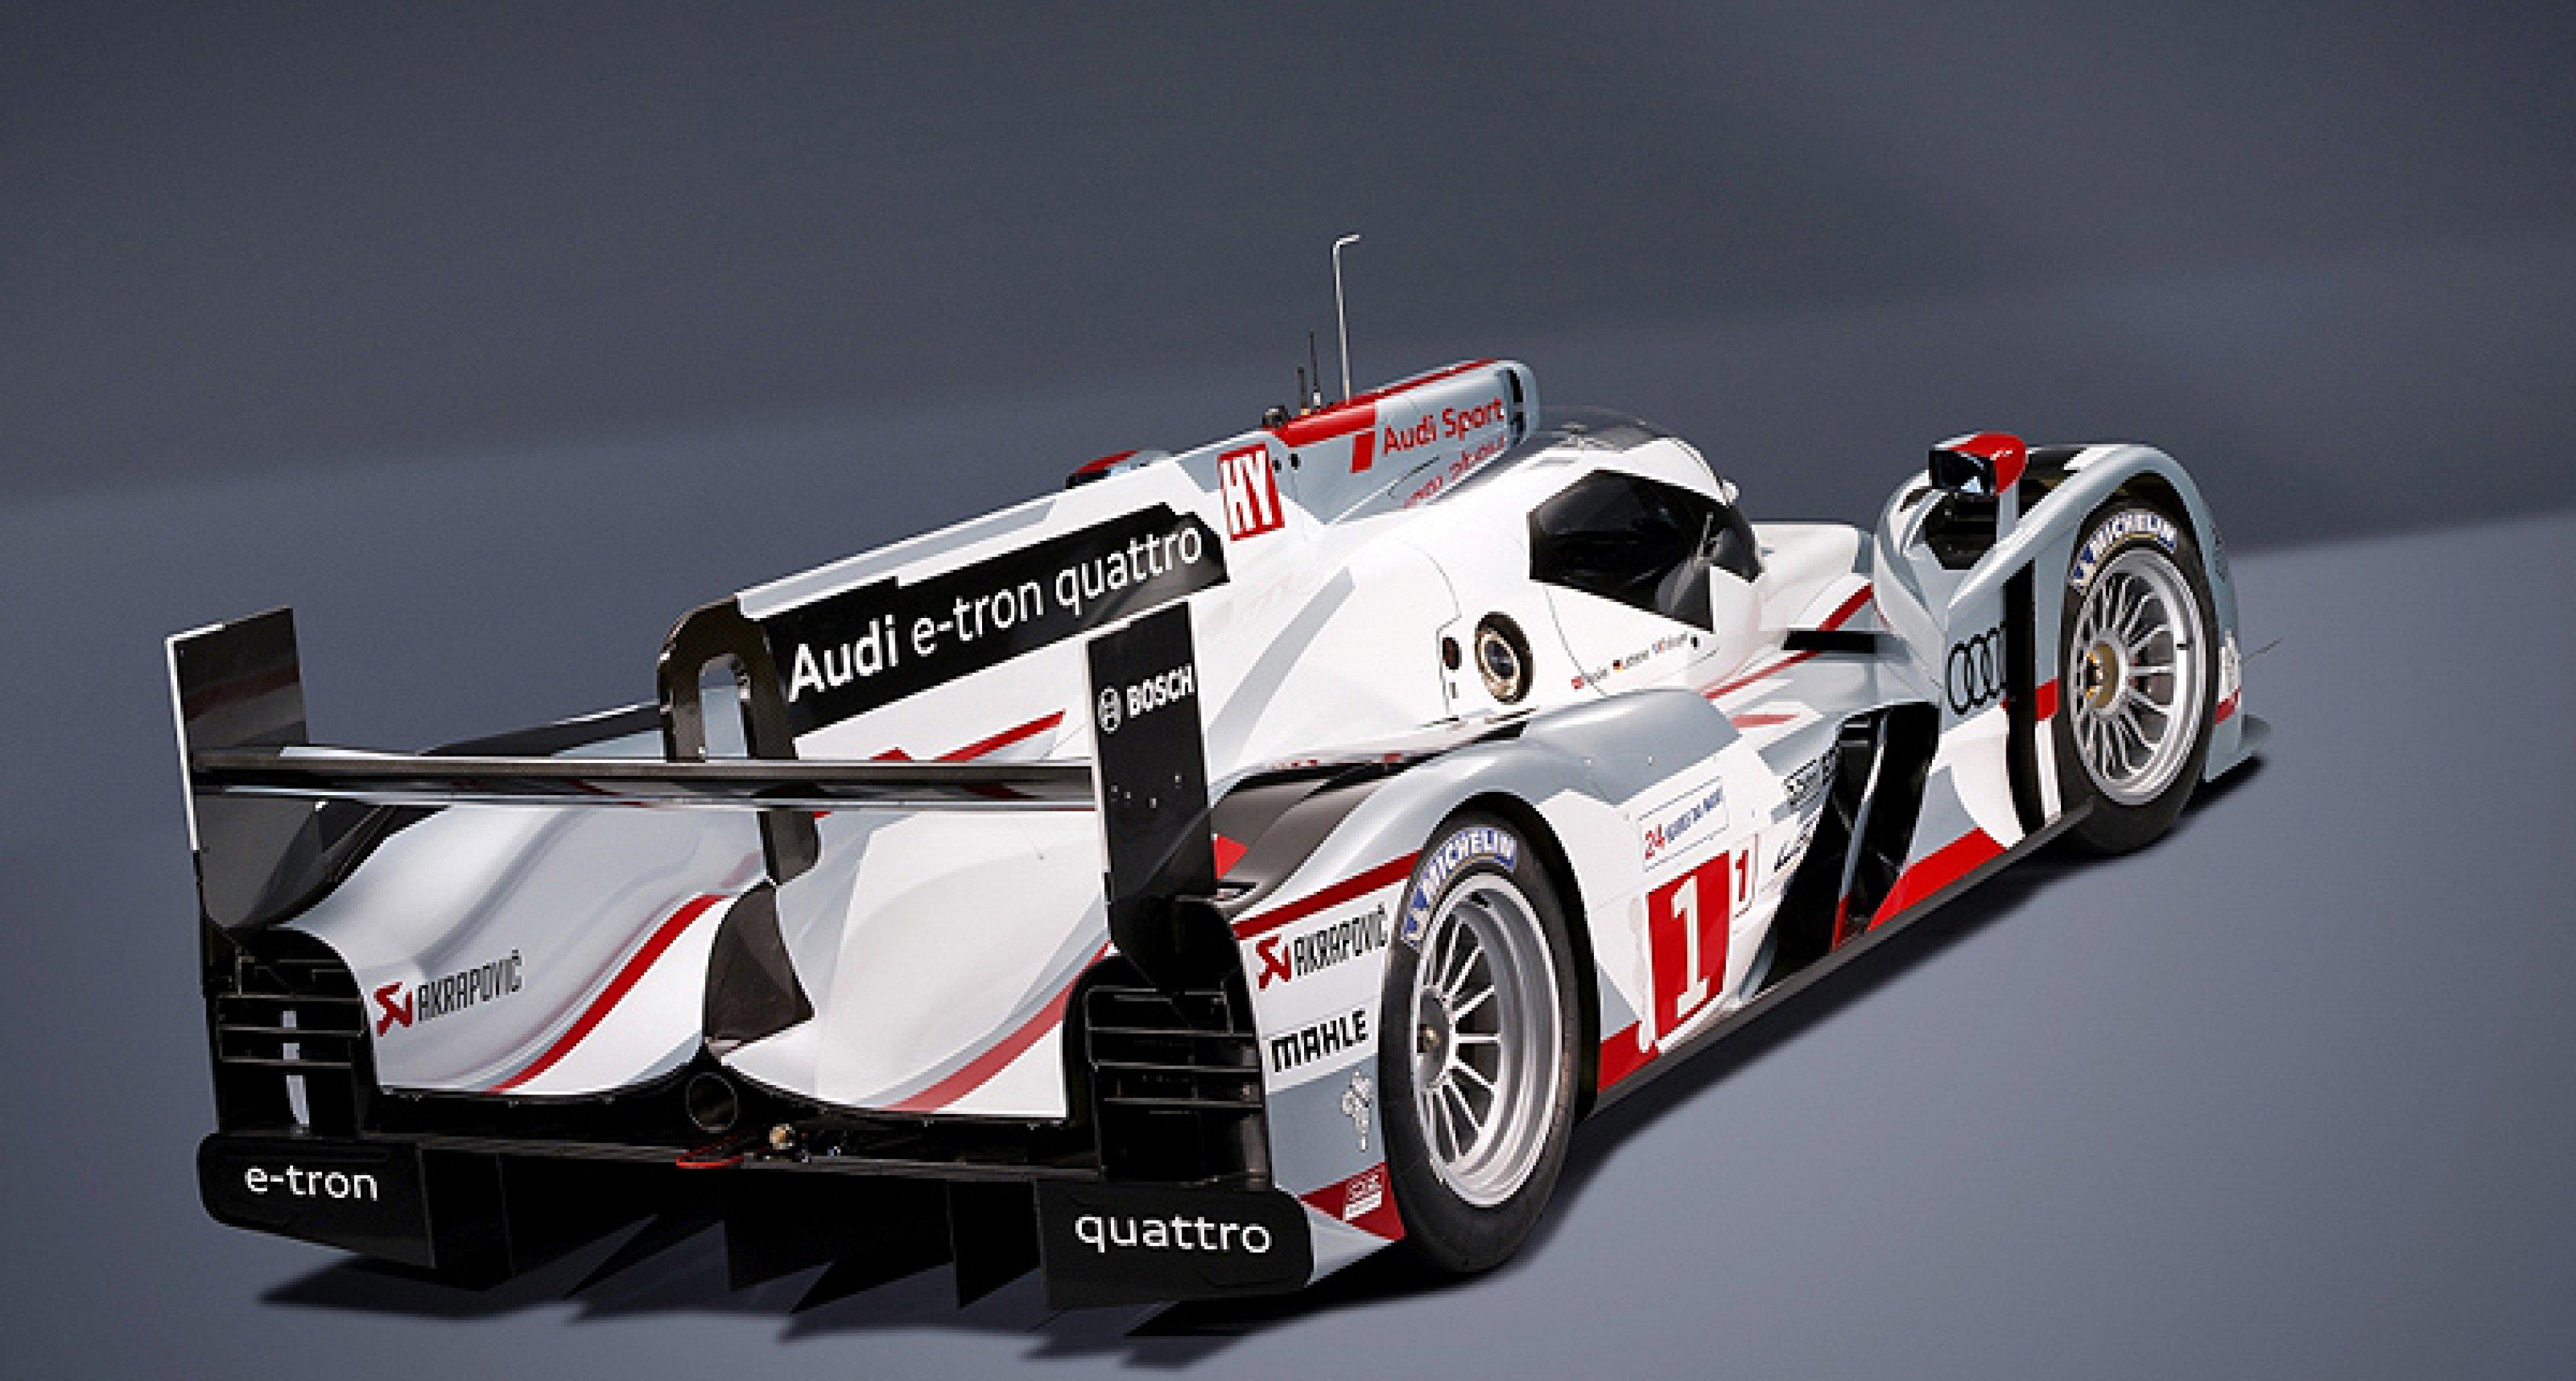 Audi R18 e-tron quattro: Hybrid-Technik für die Serie